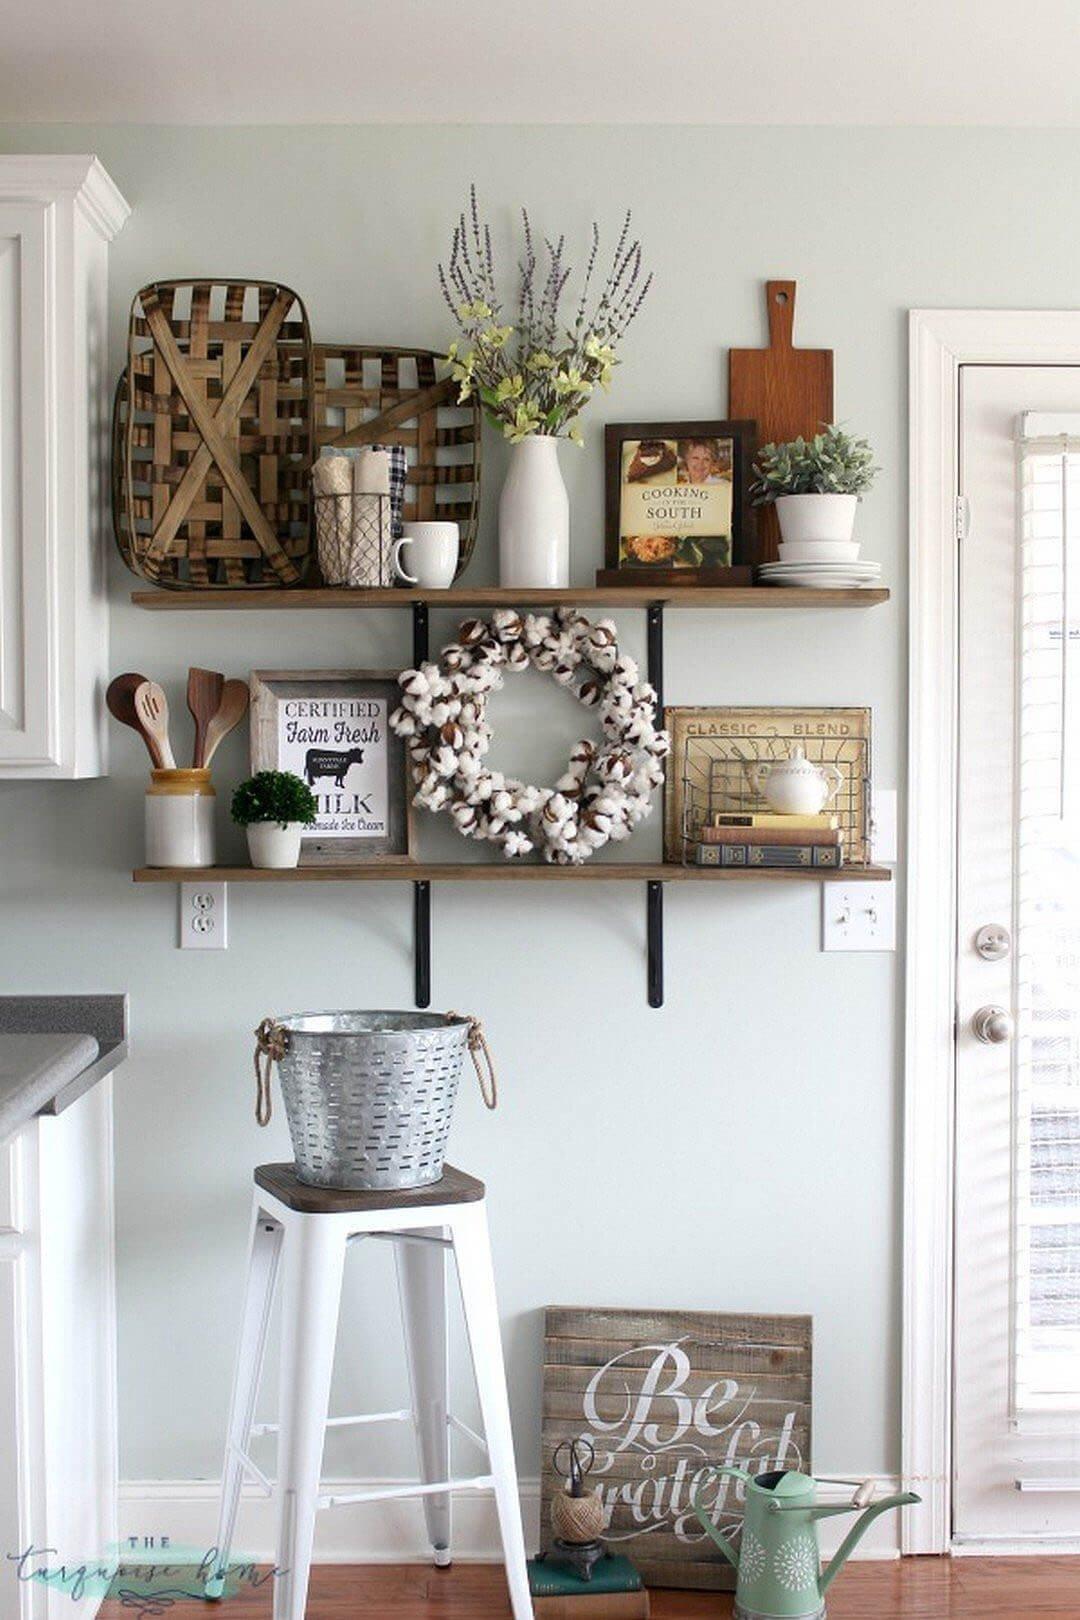 Country Kitchen Wall Decor Ideas Luxury 36 Best Kitchen Wall Decor Ideas and Designs for 2019